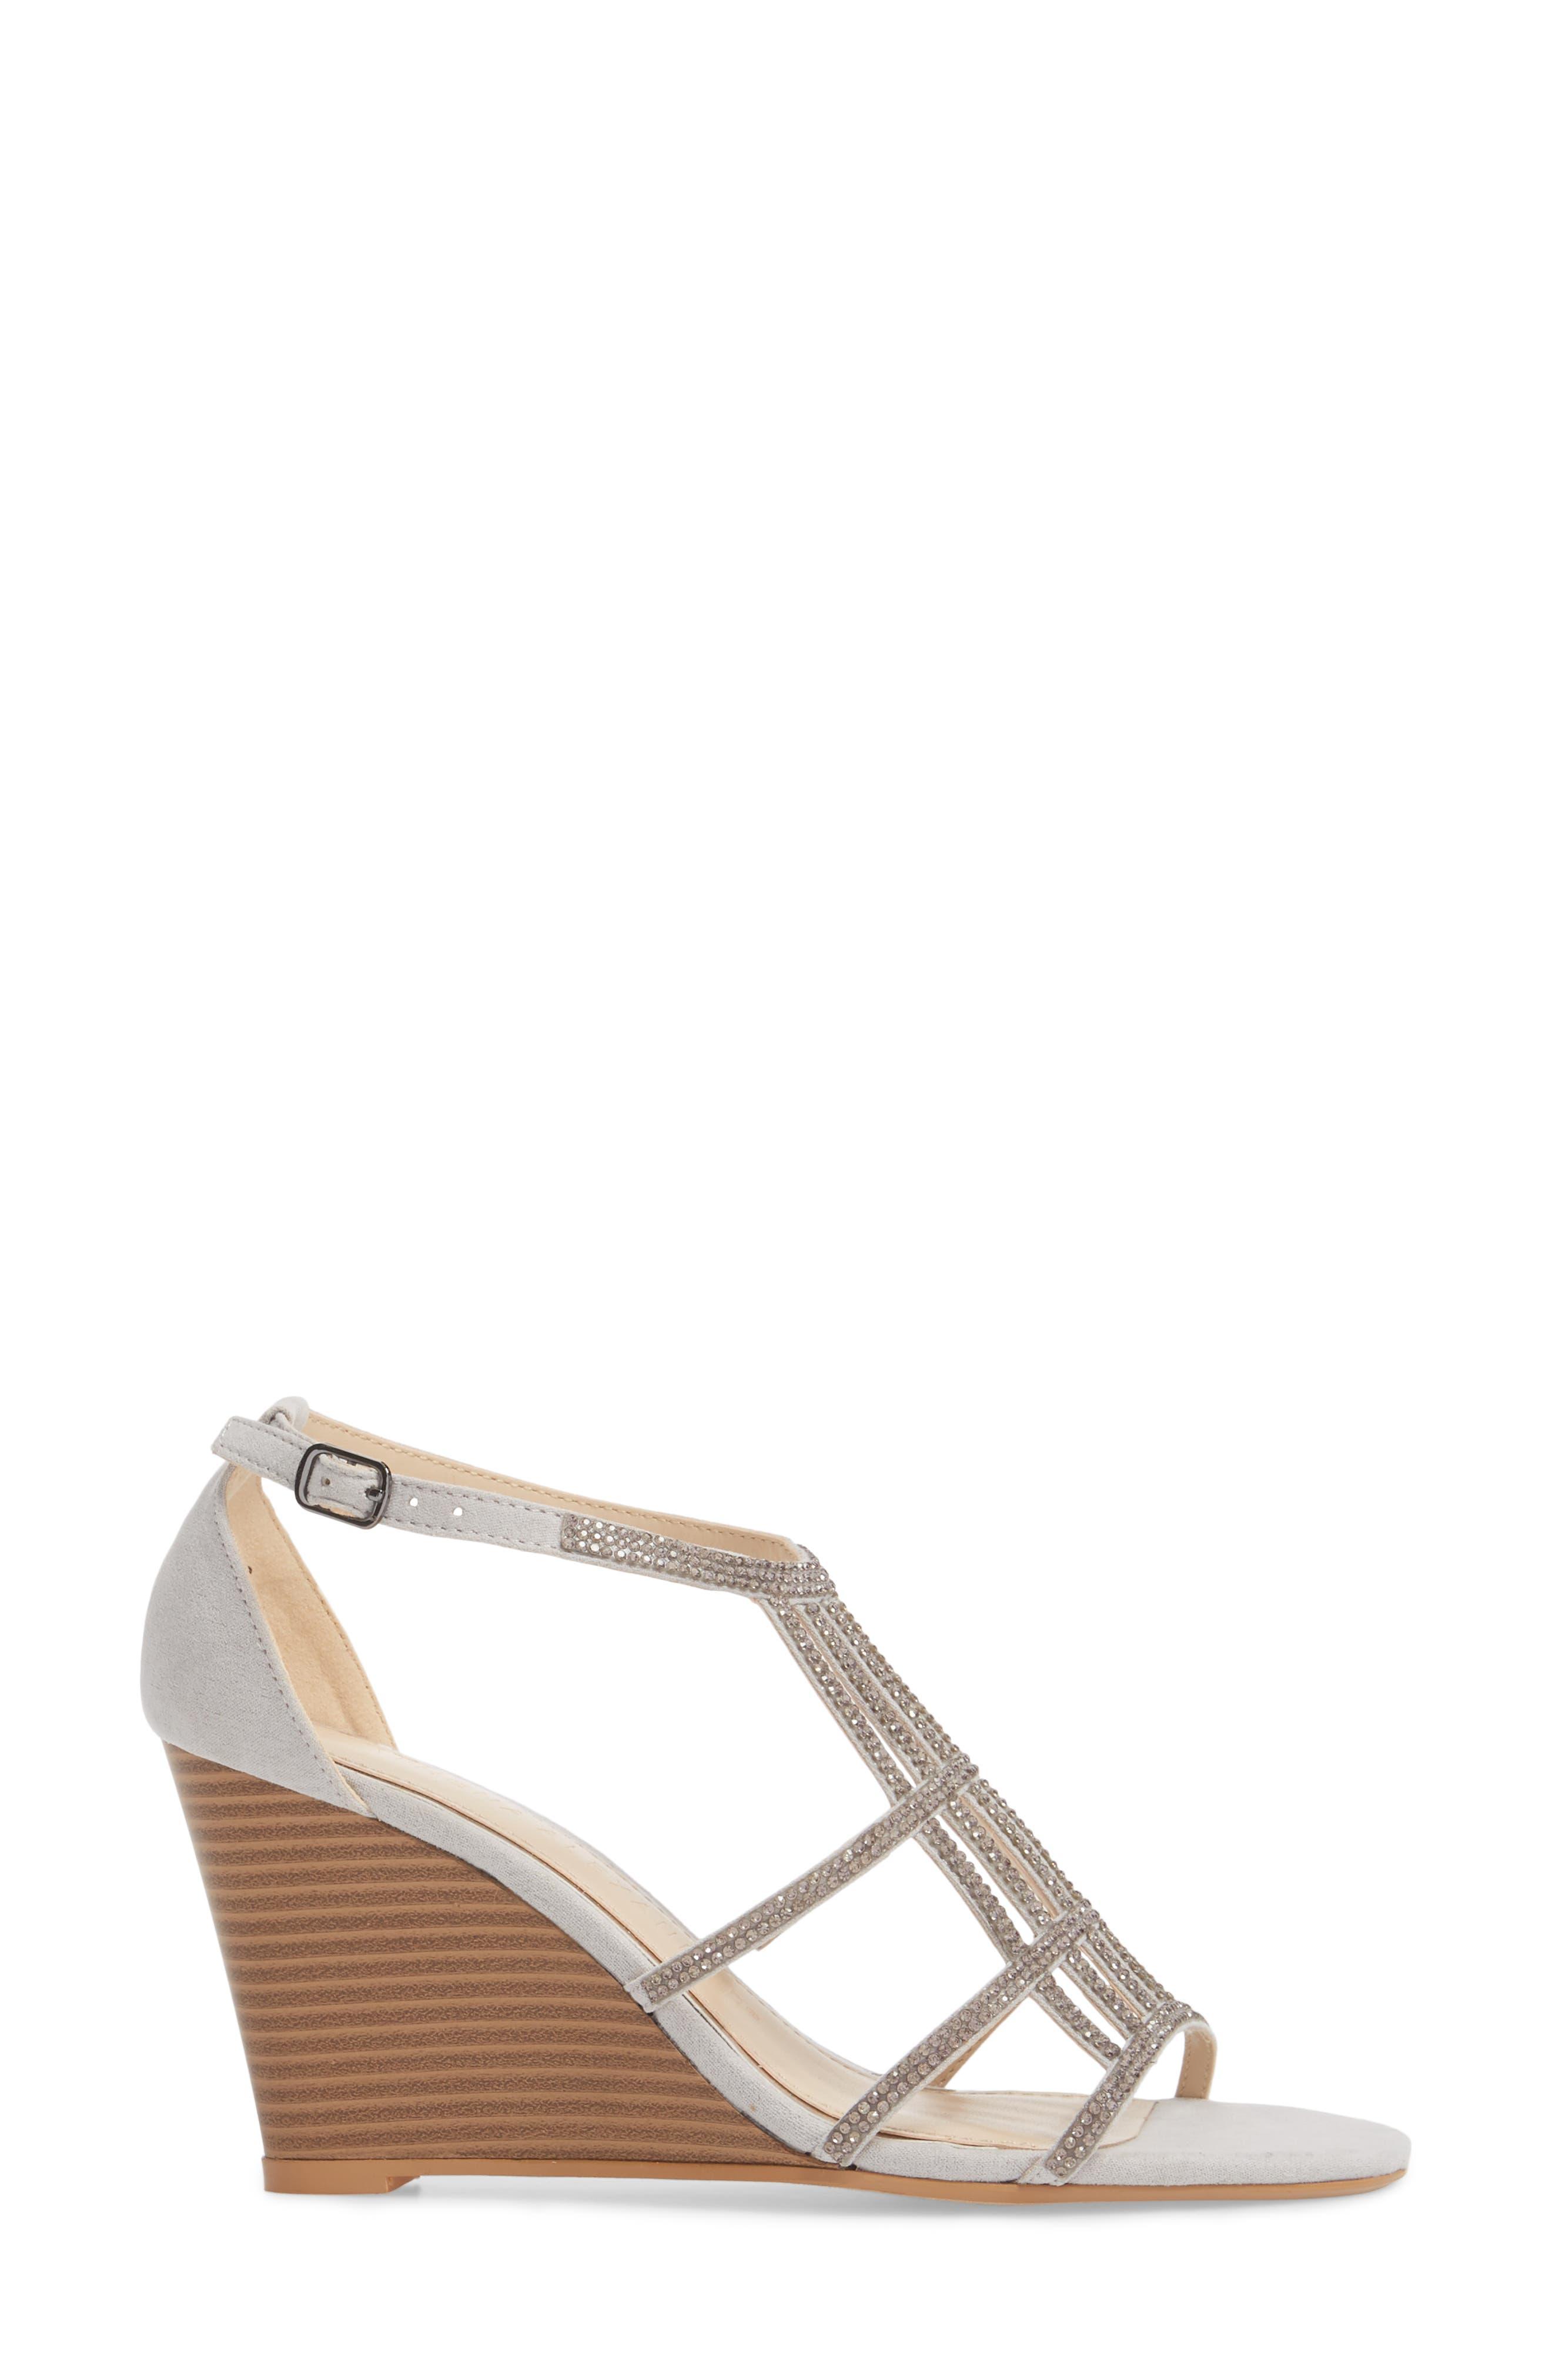 Hampton Crystal Embellished Wedge Sandal,                             Alternate thumbnail 3, color,                             Grey Suede